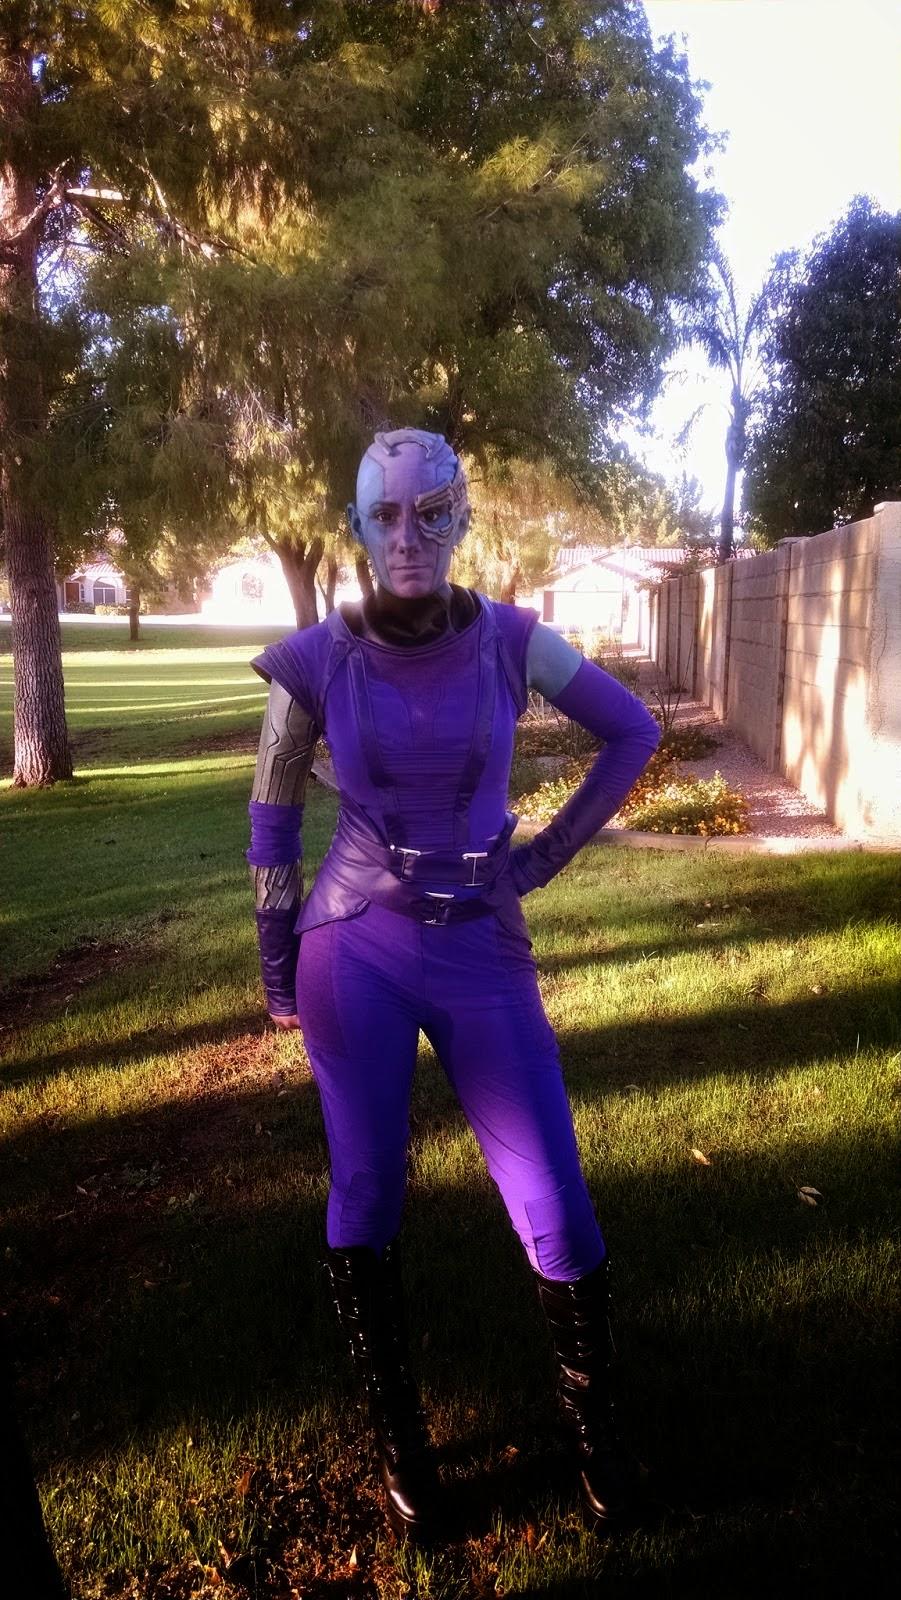 http://eatsleepwritesew.blogspot.com/2014/10/nebula-guardians-of-galaxy.html